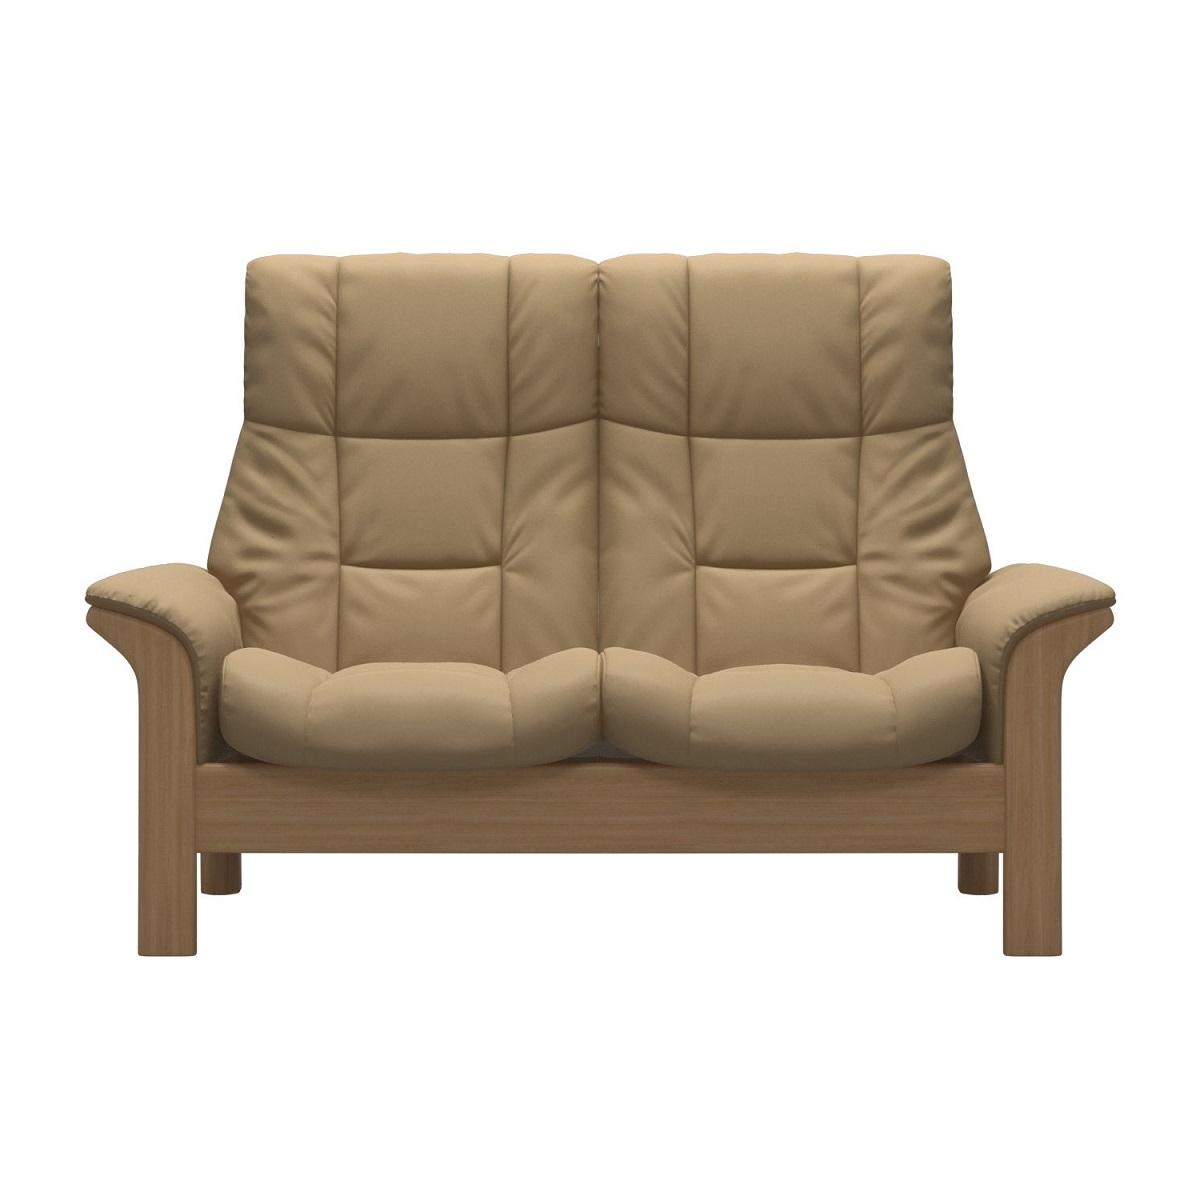 Stressless Windsor 2 Seater High Back Sand Sofa